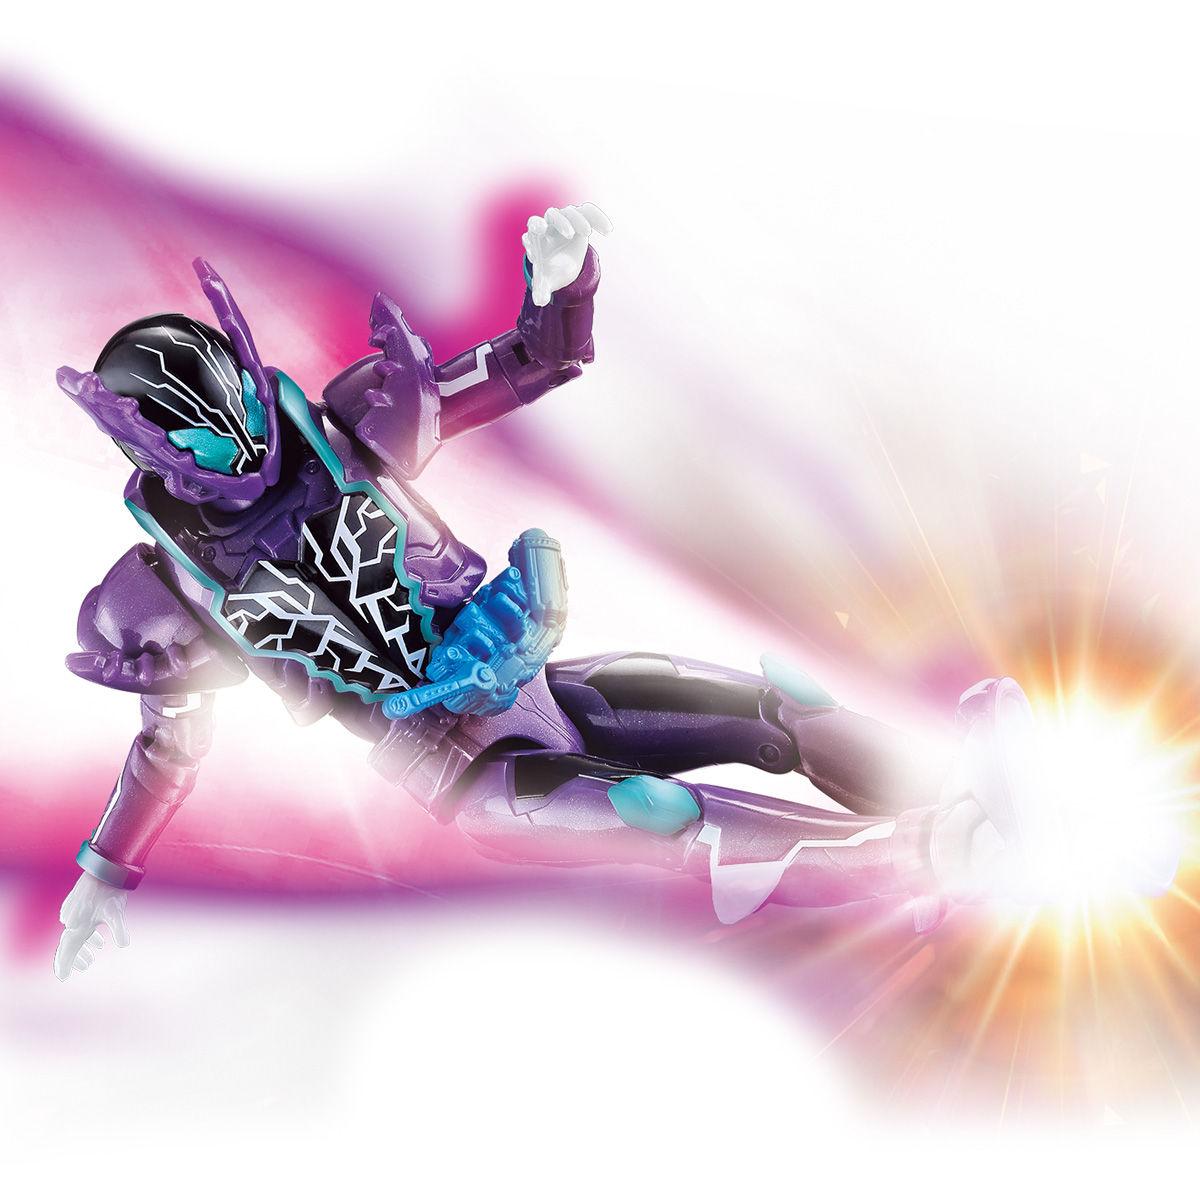 RKFレジェンドライダーシリーズ『仮面ライダーローグ』可動フィギュア-006